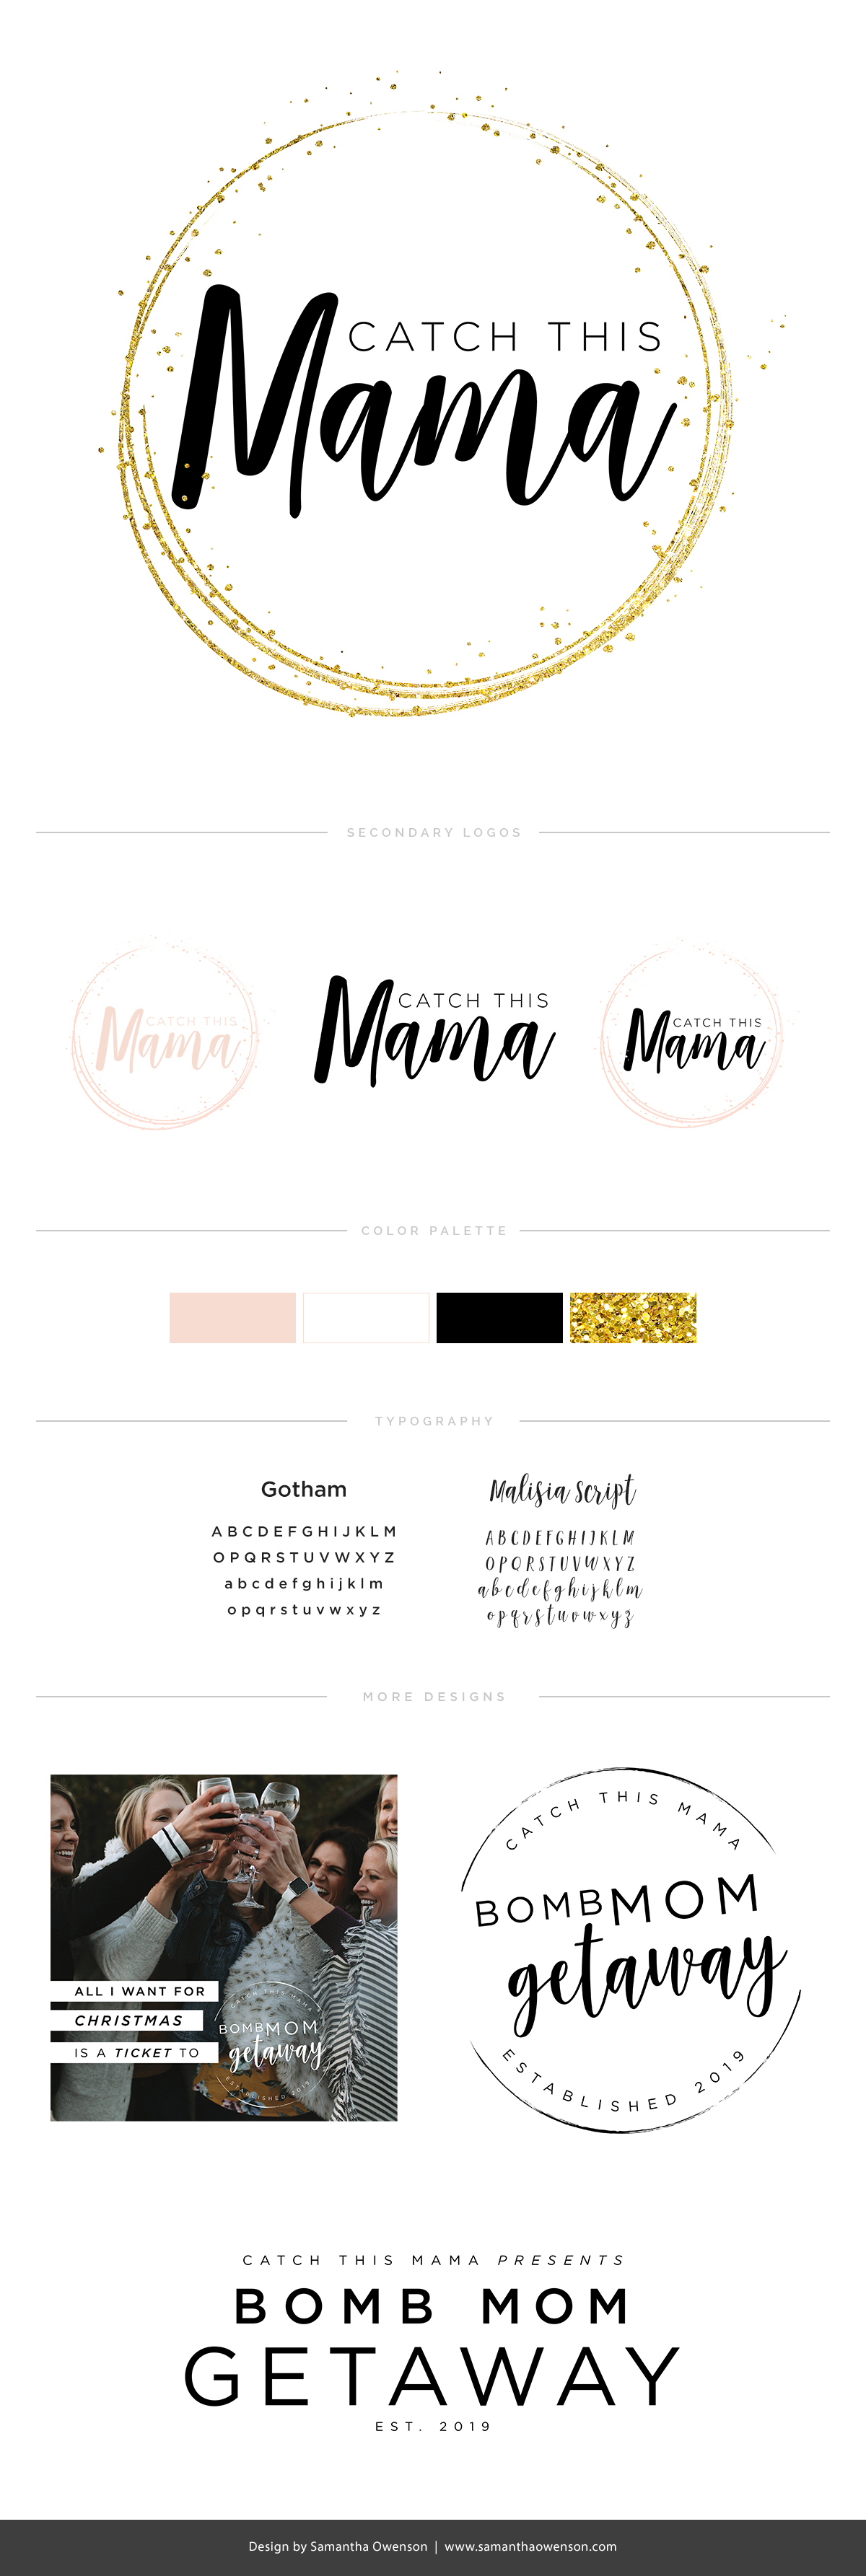 Des Moines Graphic Designer